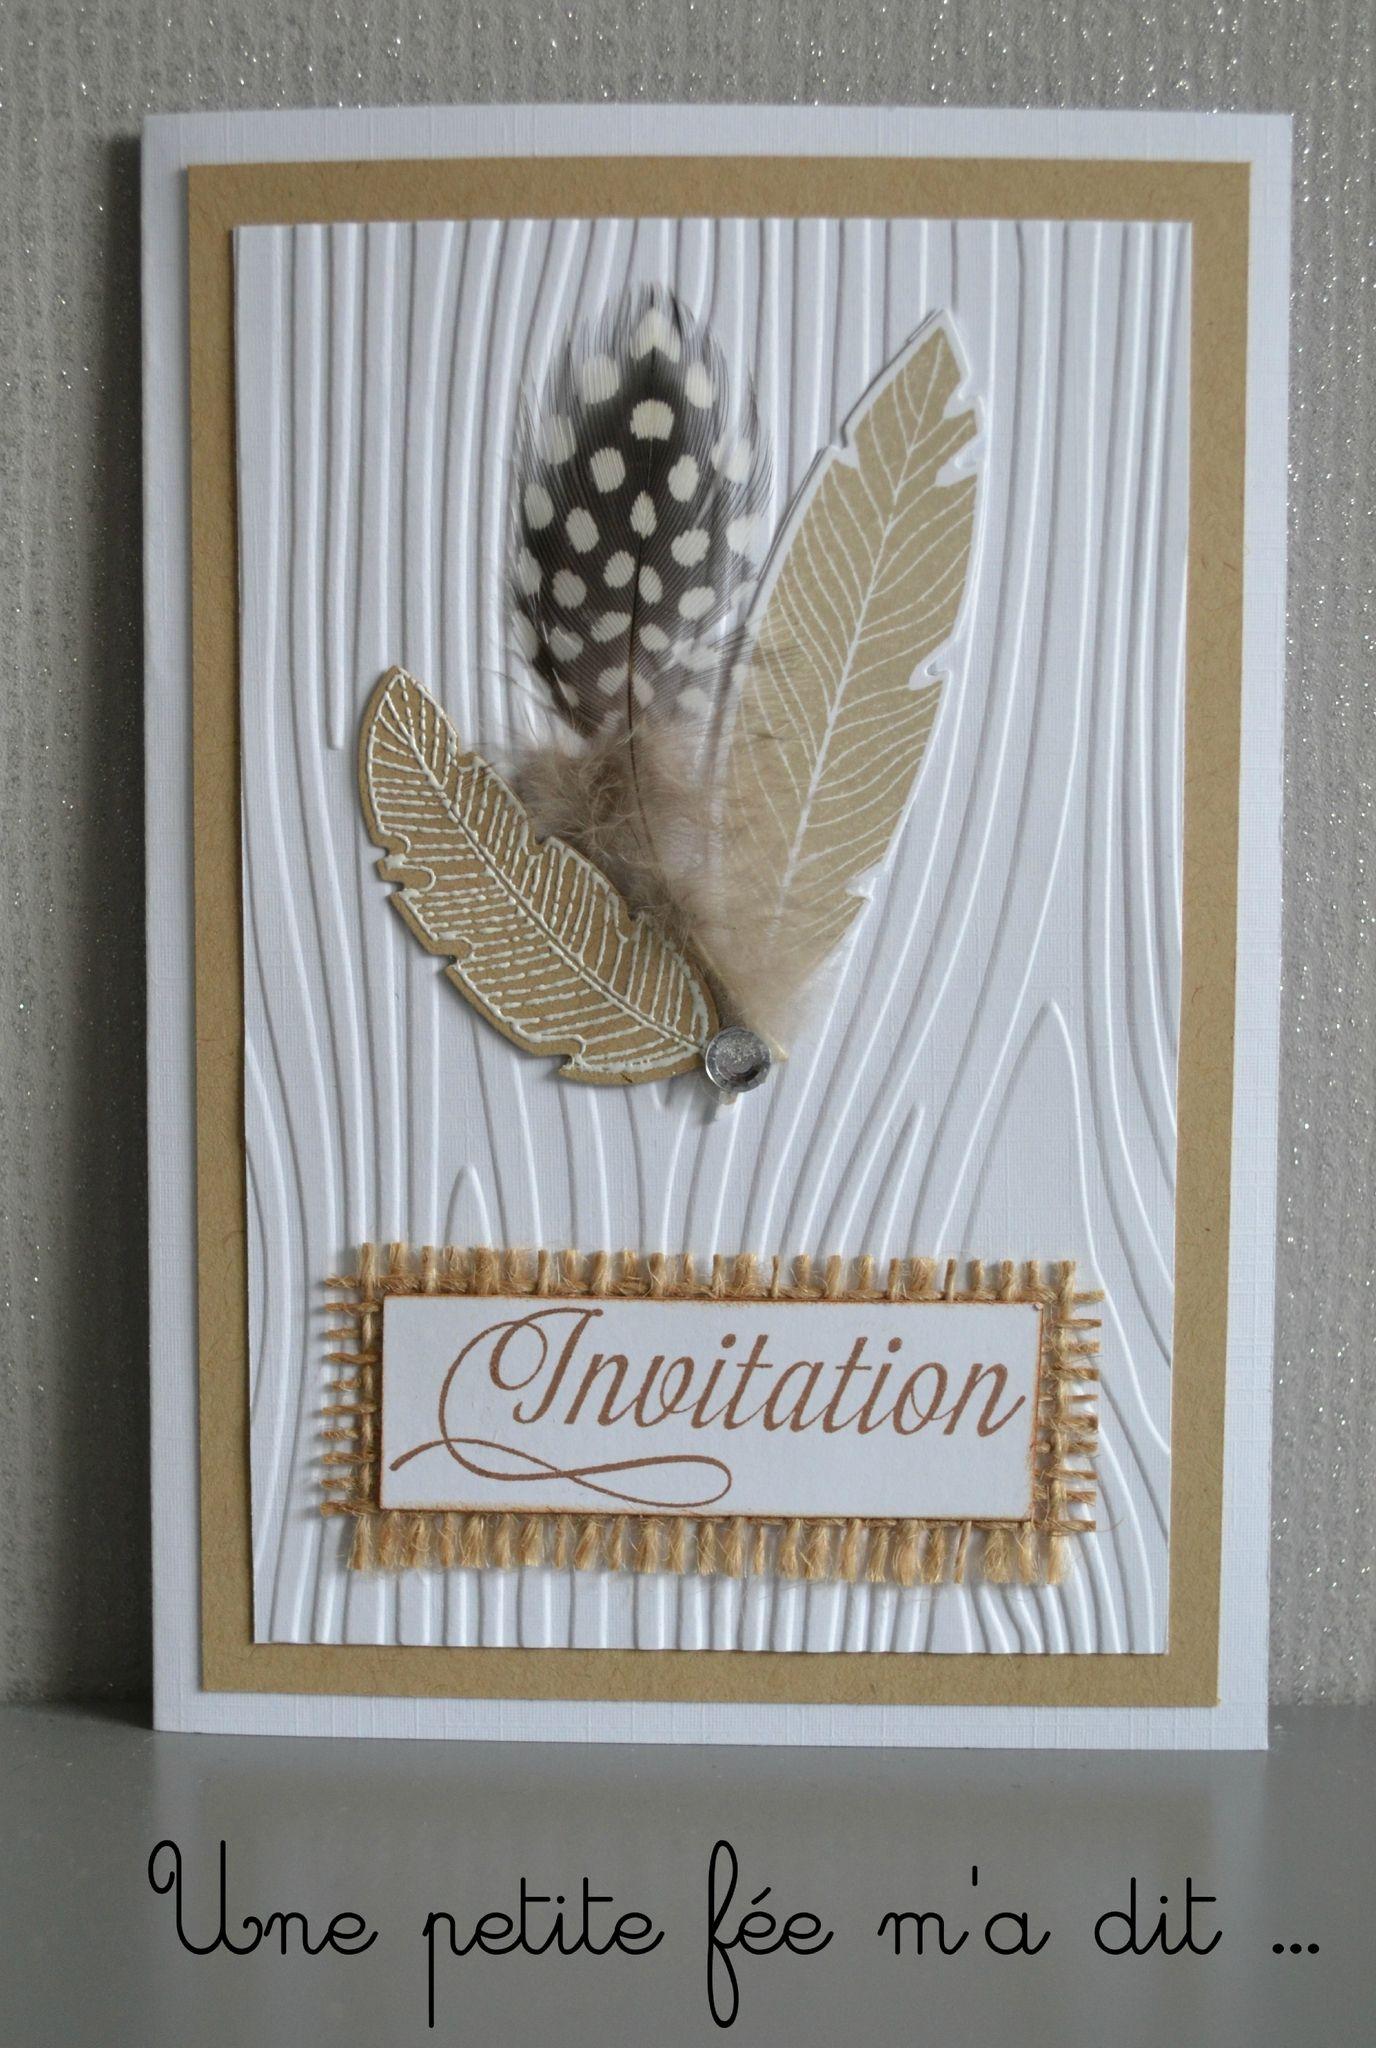 invitation communion th me nature une petite f e m 39 a dit pinterest theme nature. Black Bedroom Furniture Sets. Home Design Ideas